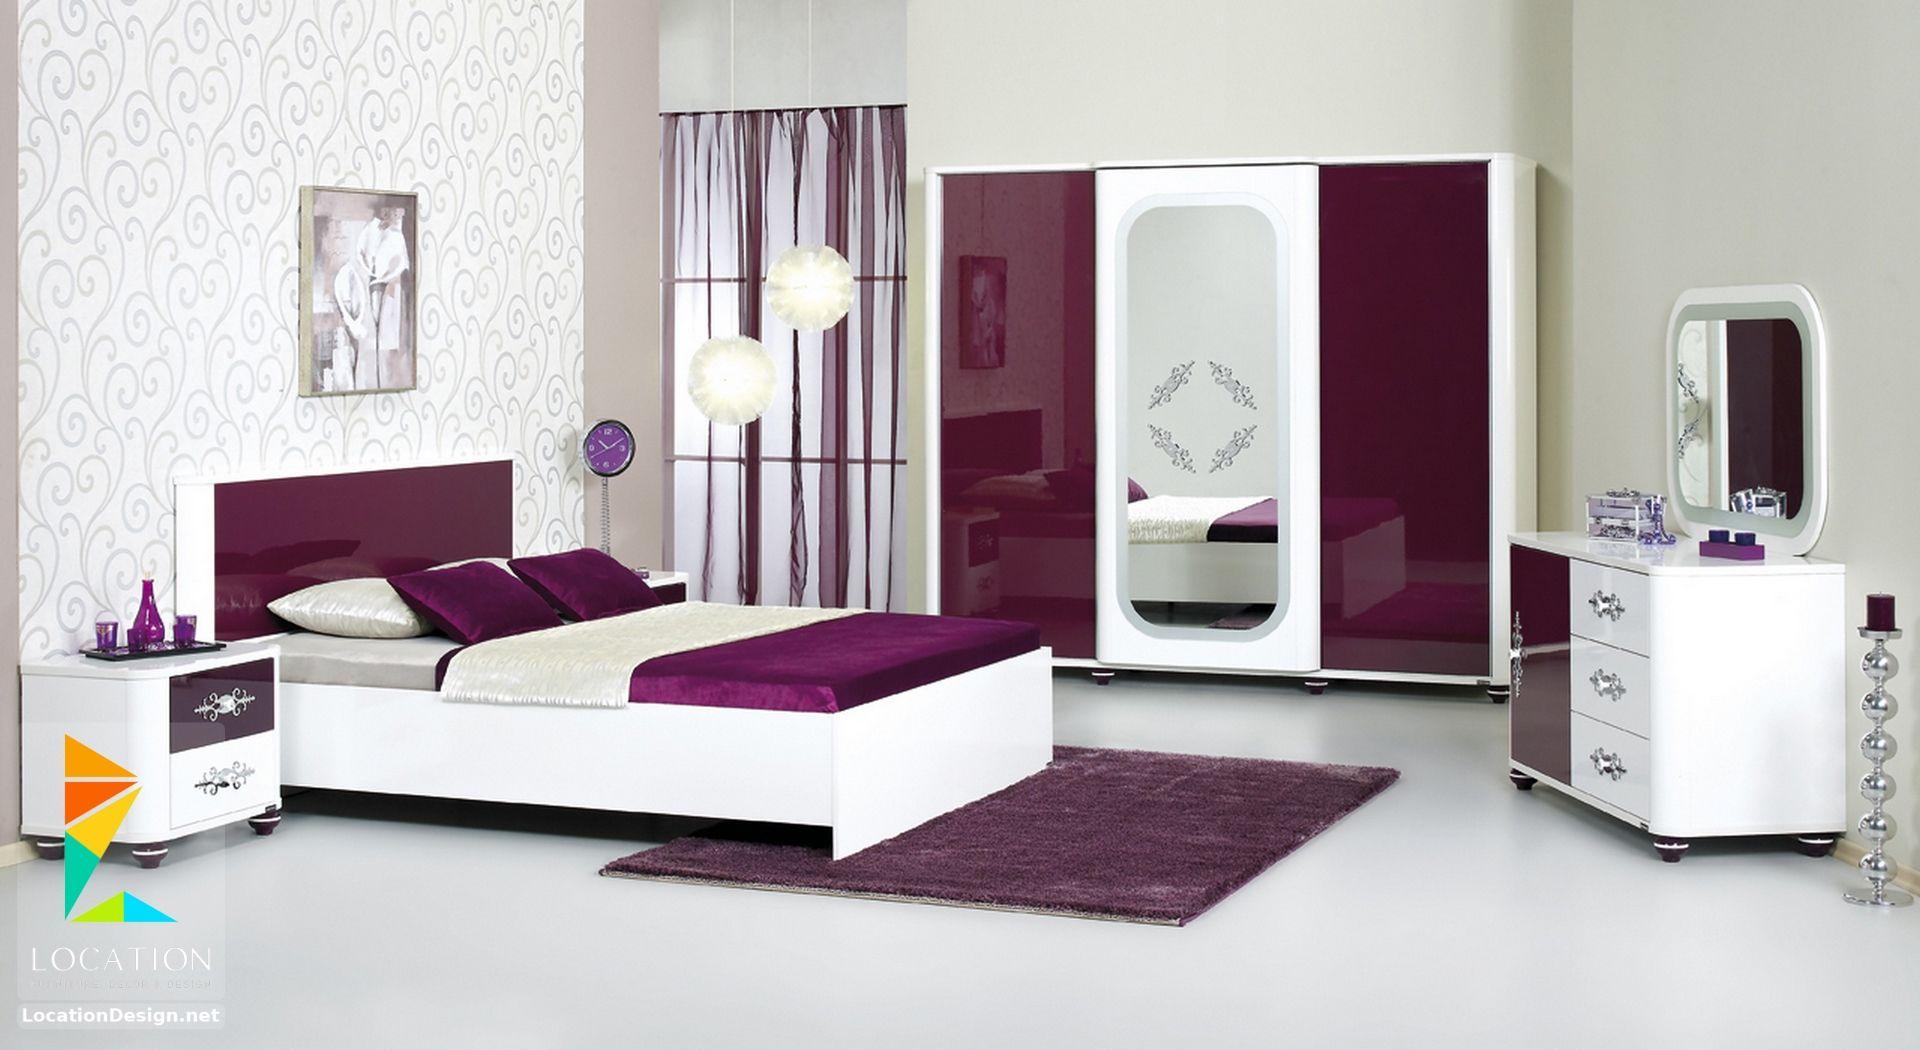 احدث موديلات و اشكال غرف نوم تركي 2019 2020 Sitting Room Decor Room Decor Bedroom Rose Gold Contemporary Bedroom Design